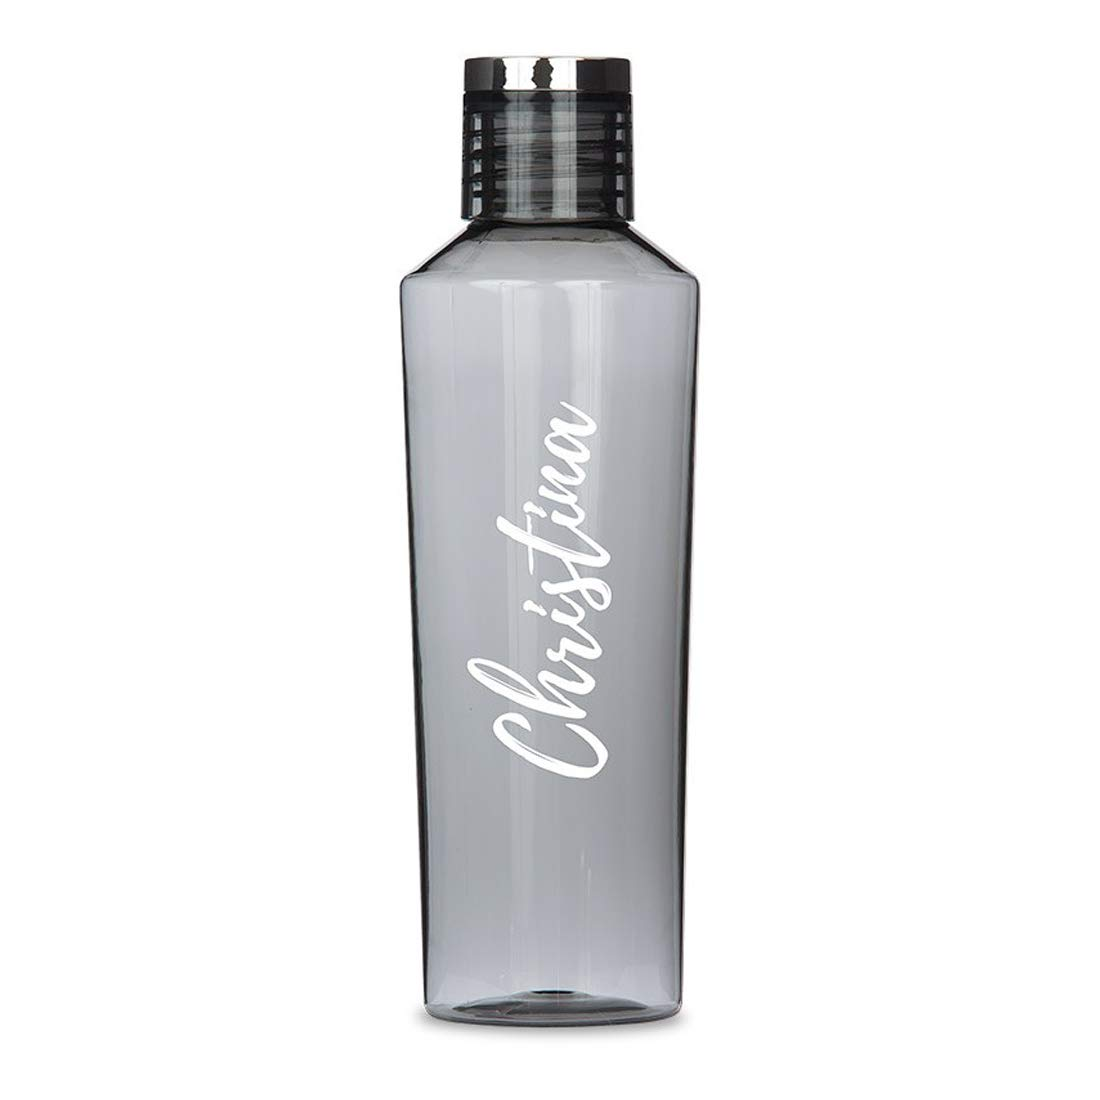 Weddingstar Personalized Tritan Plastic Water Bottle 27oz – Reusable Customizable Eco-Friendly Plastic Water Bottle – 100% BPA-Free Environmentally Friendly Canteen - Calligraphy Print Charcoal